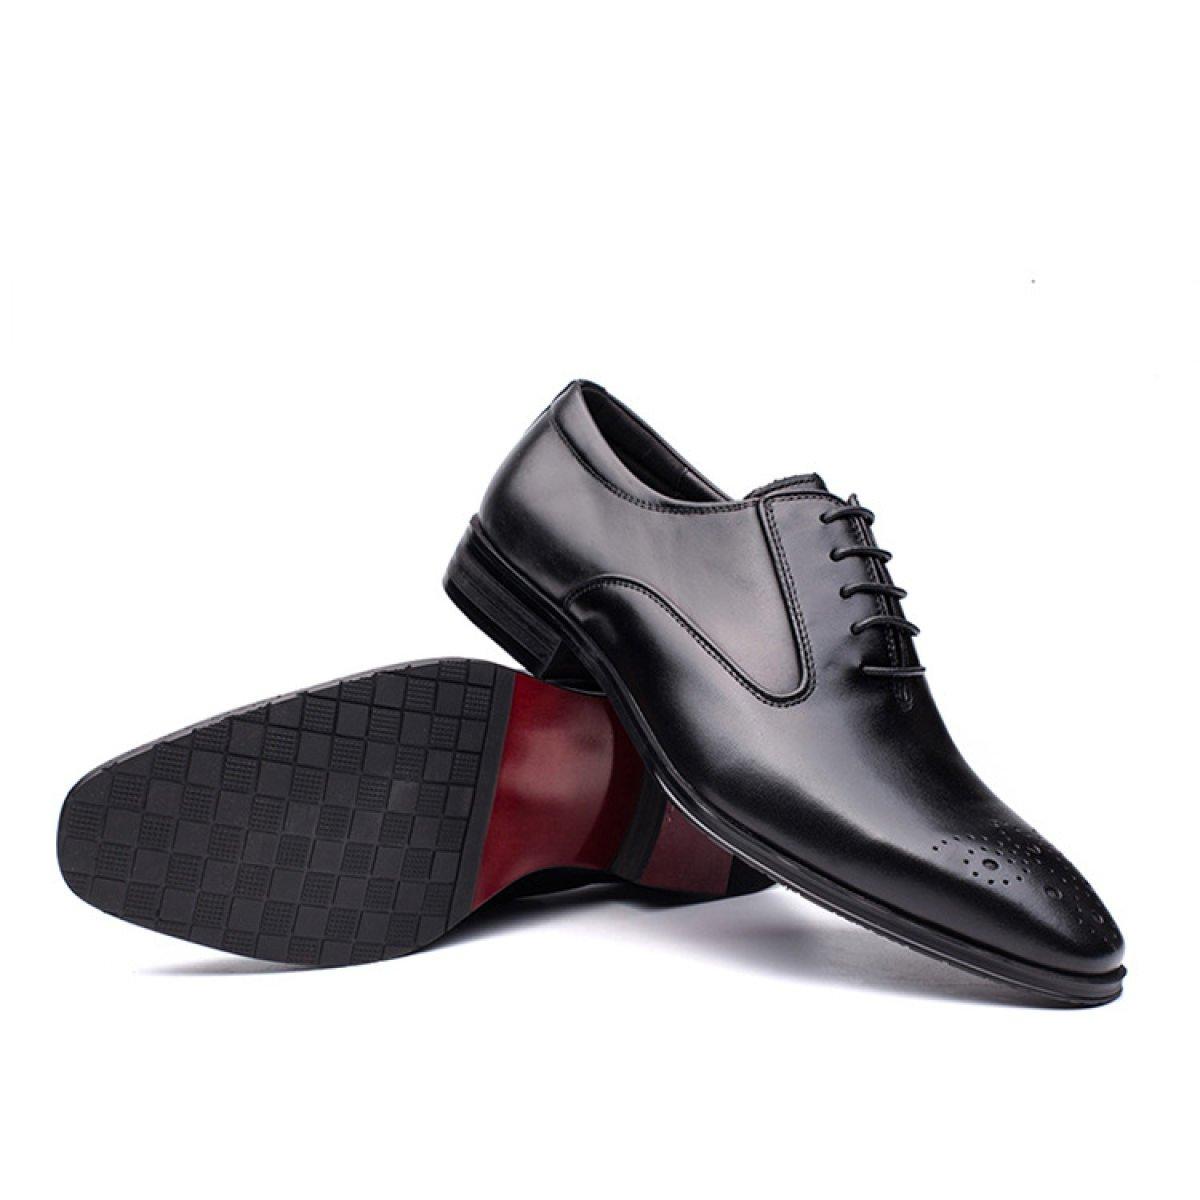 ZPFME Männer Business Casual Schuhe Wies Lace Mens Up Brogues Schuhe Mens Lace Klassische Hochzeitsschuhe 208c58